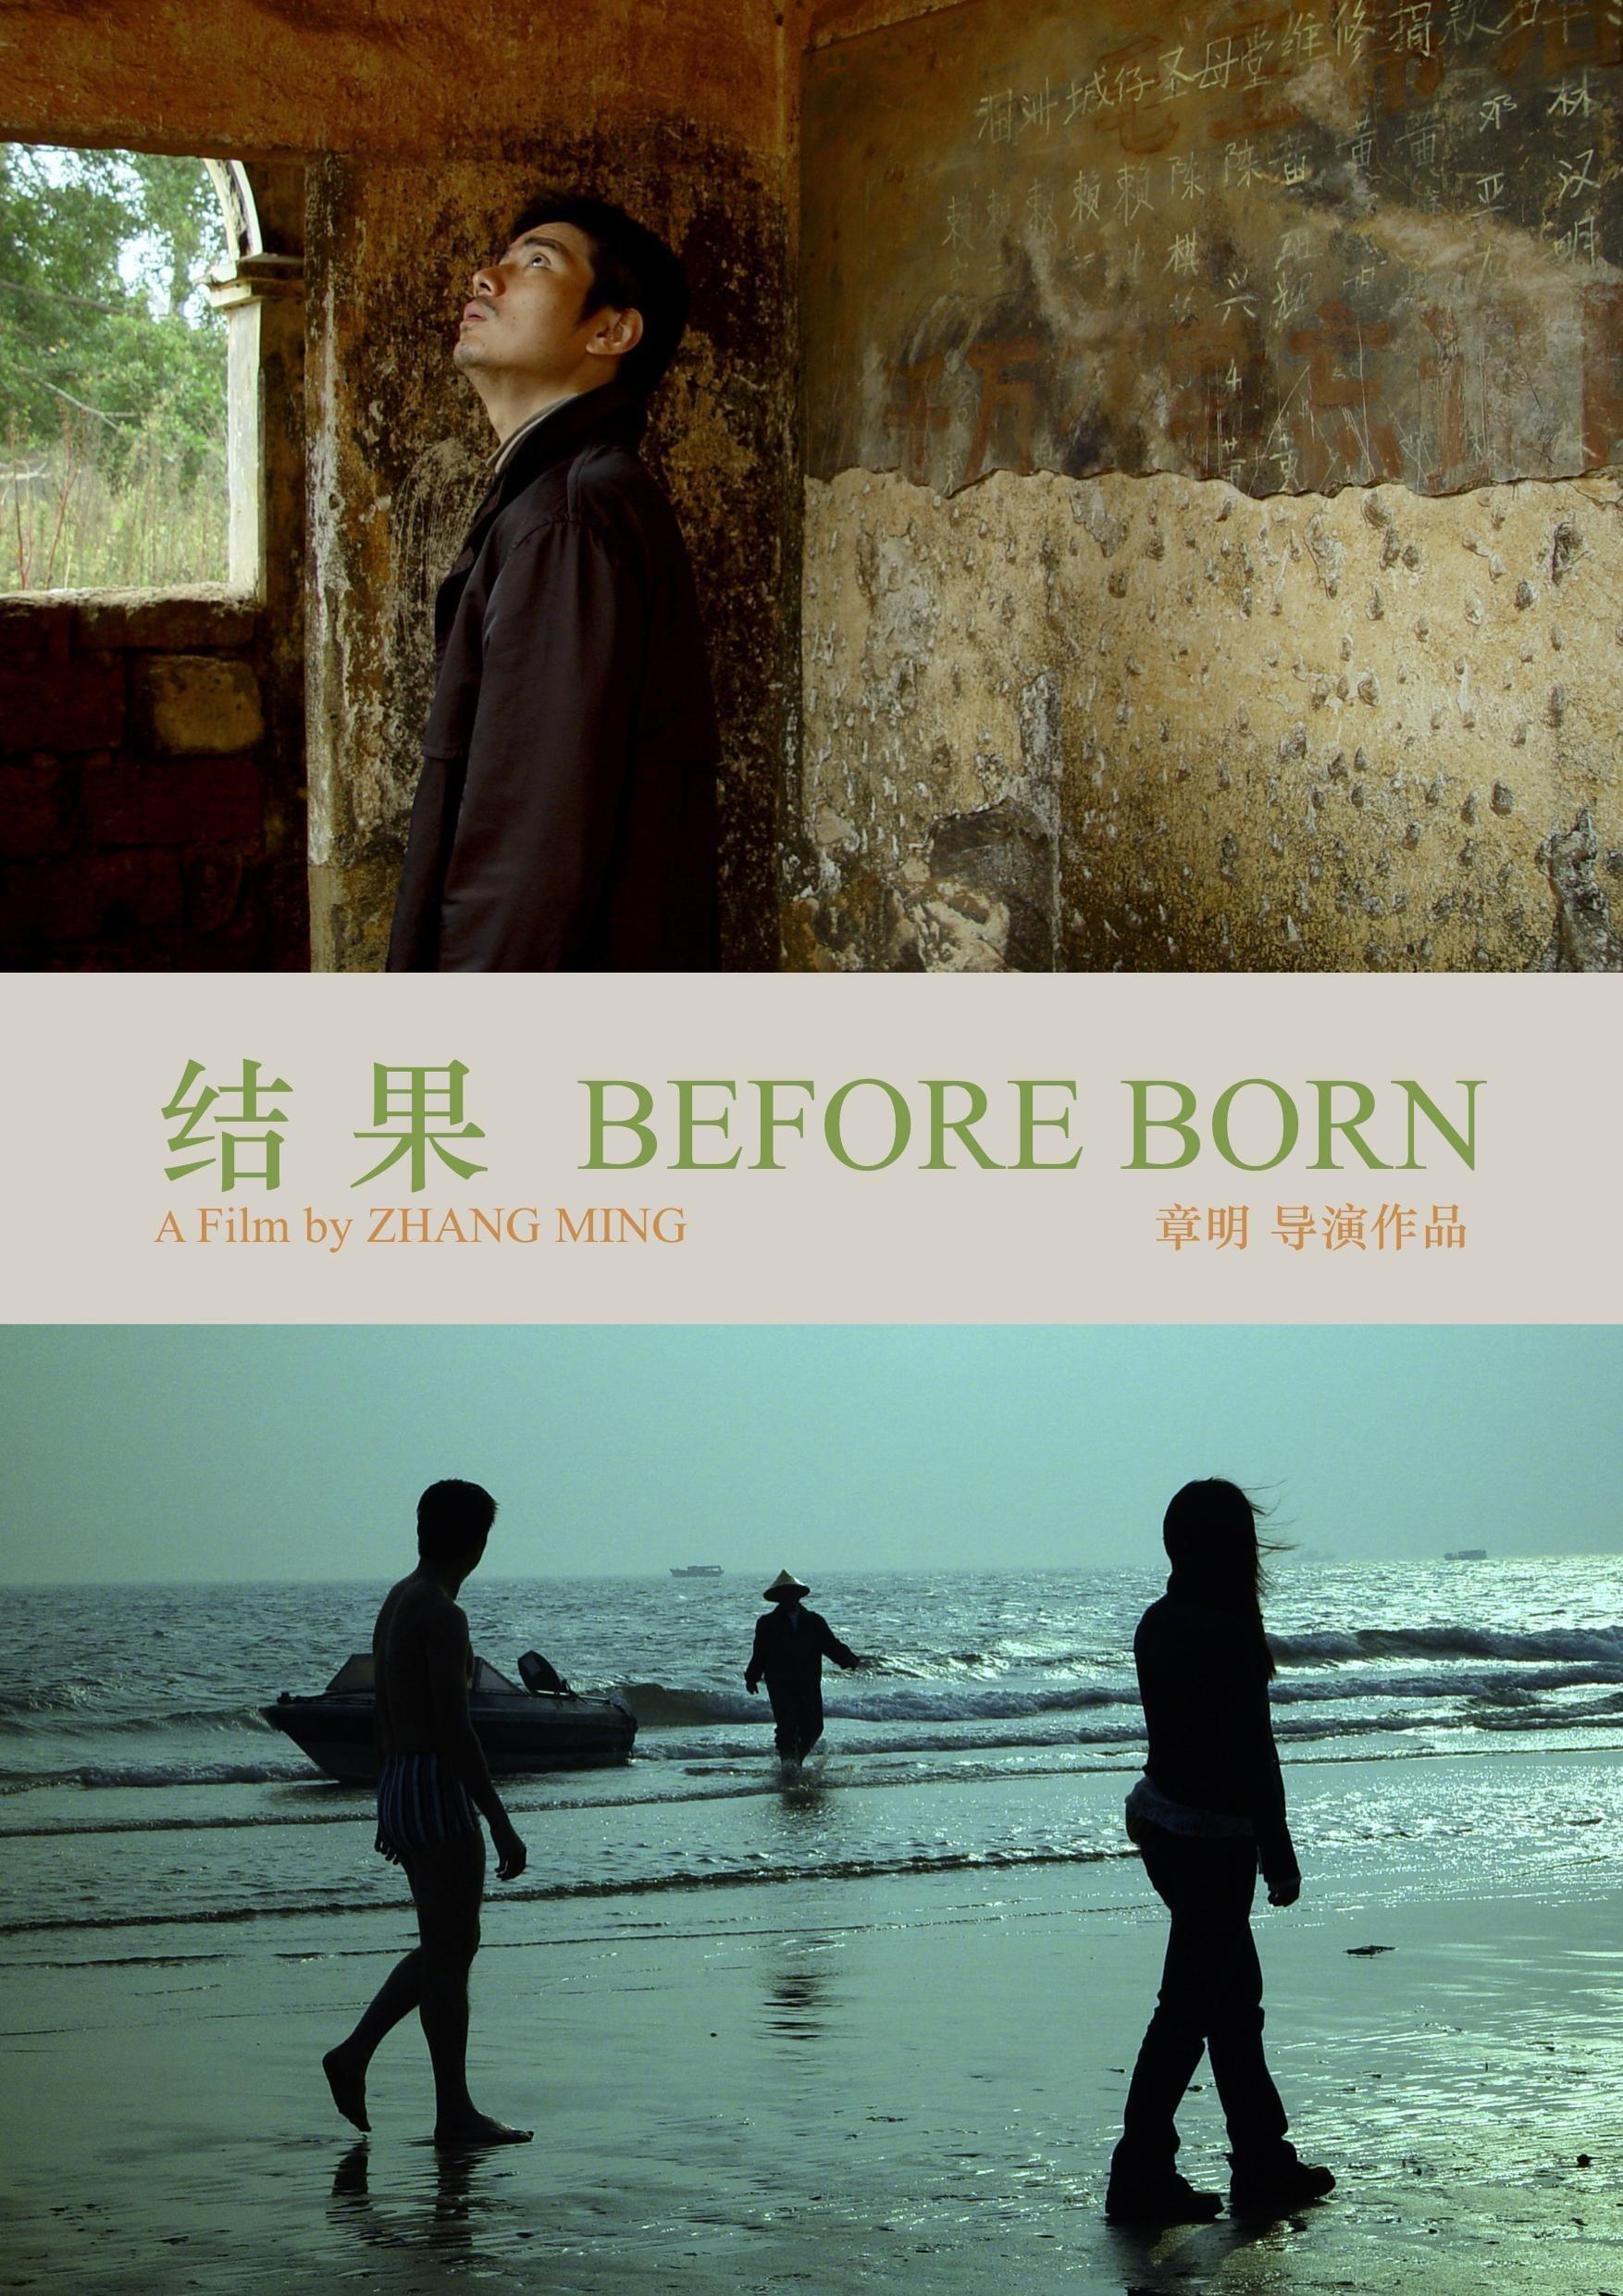 Before Born